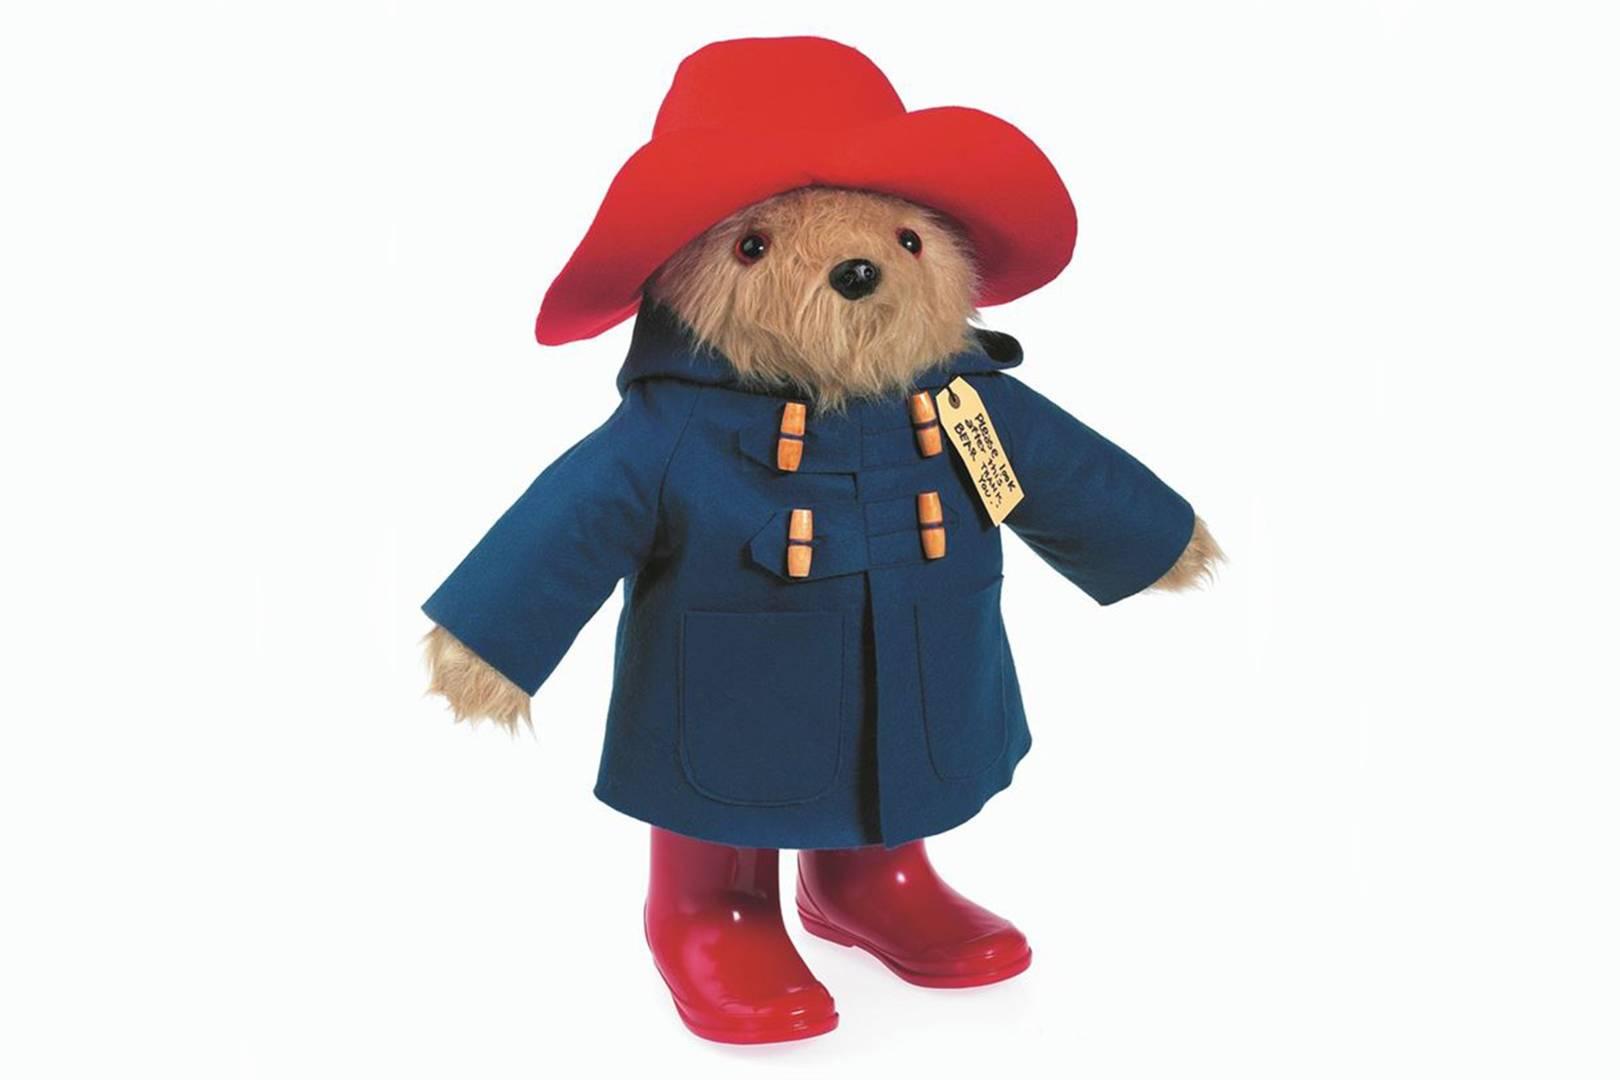 be41dc8de Traditional Wooden Retro Toys For Boys Girls Children | British Vogue